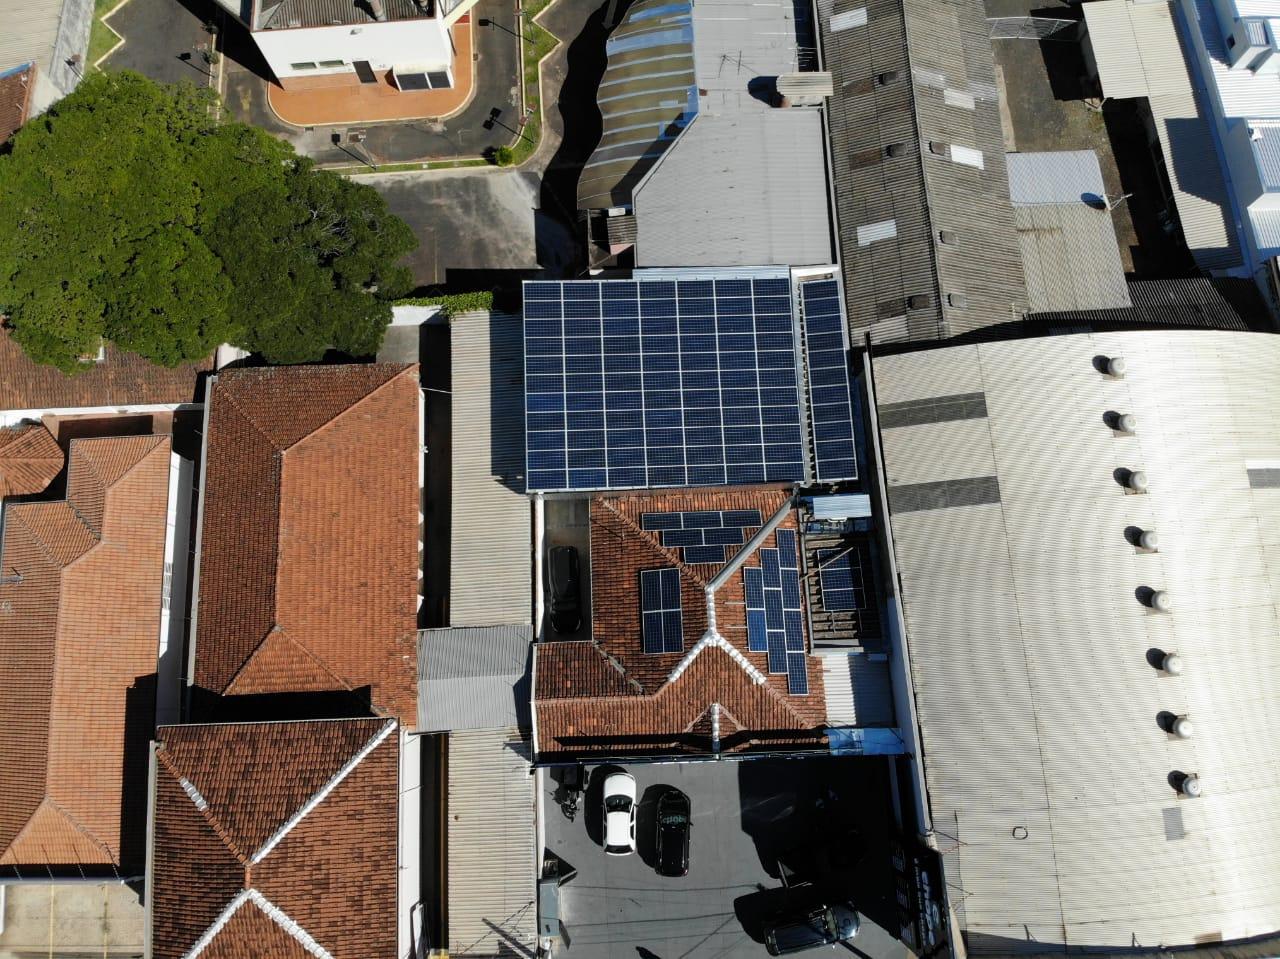 echopp-energia-solar-fotovoltaica-araraquara-sao-carlos-matao